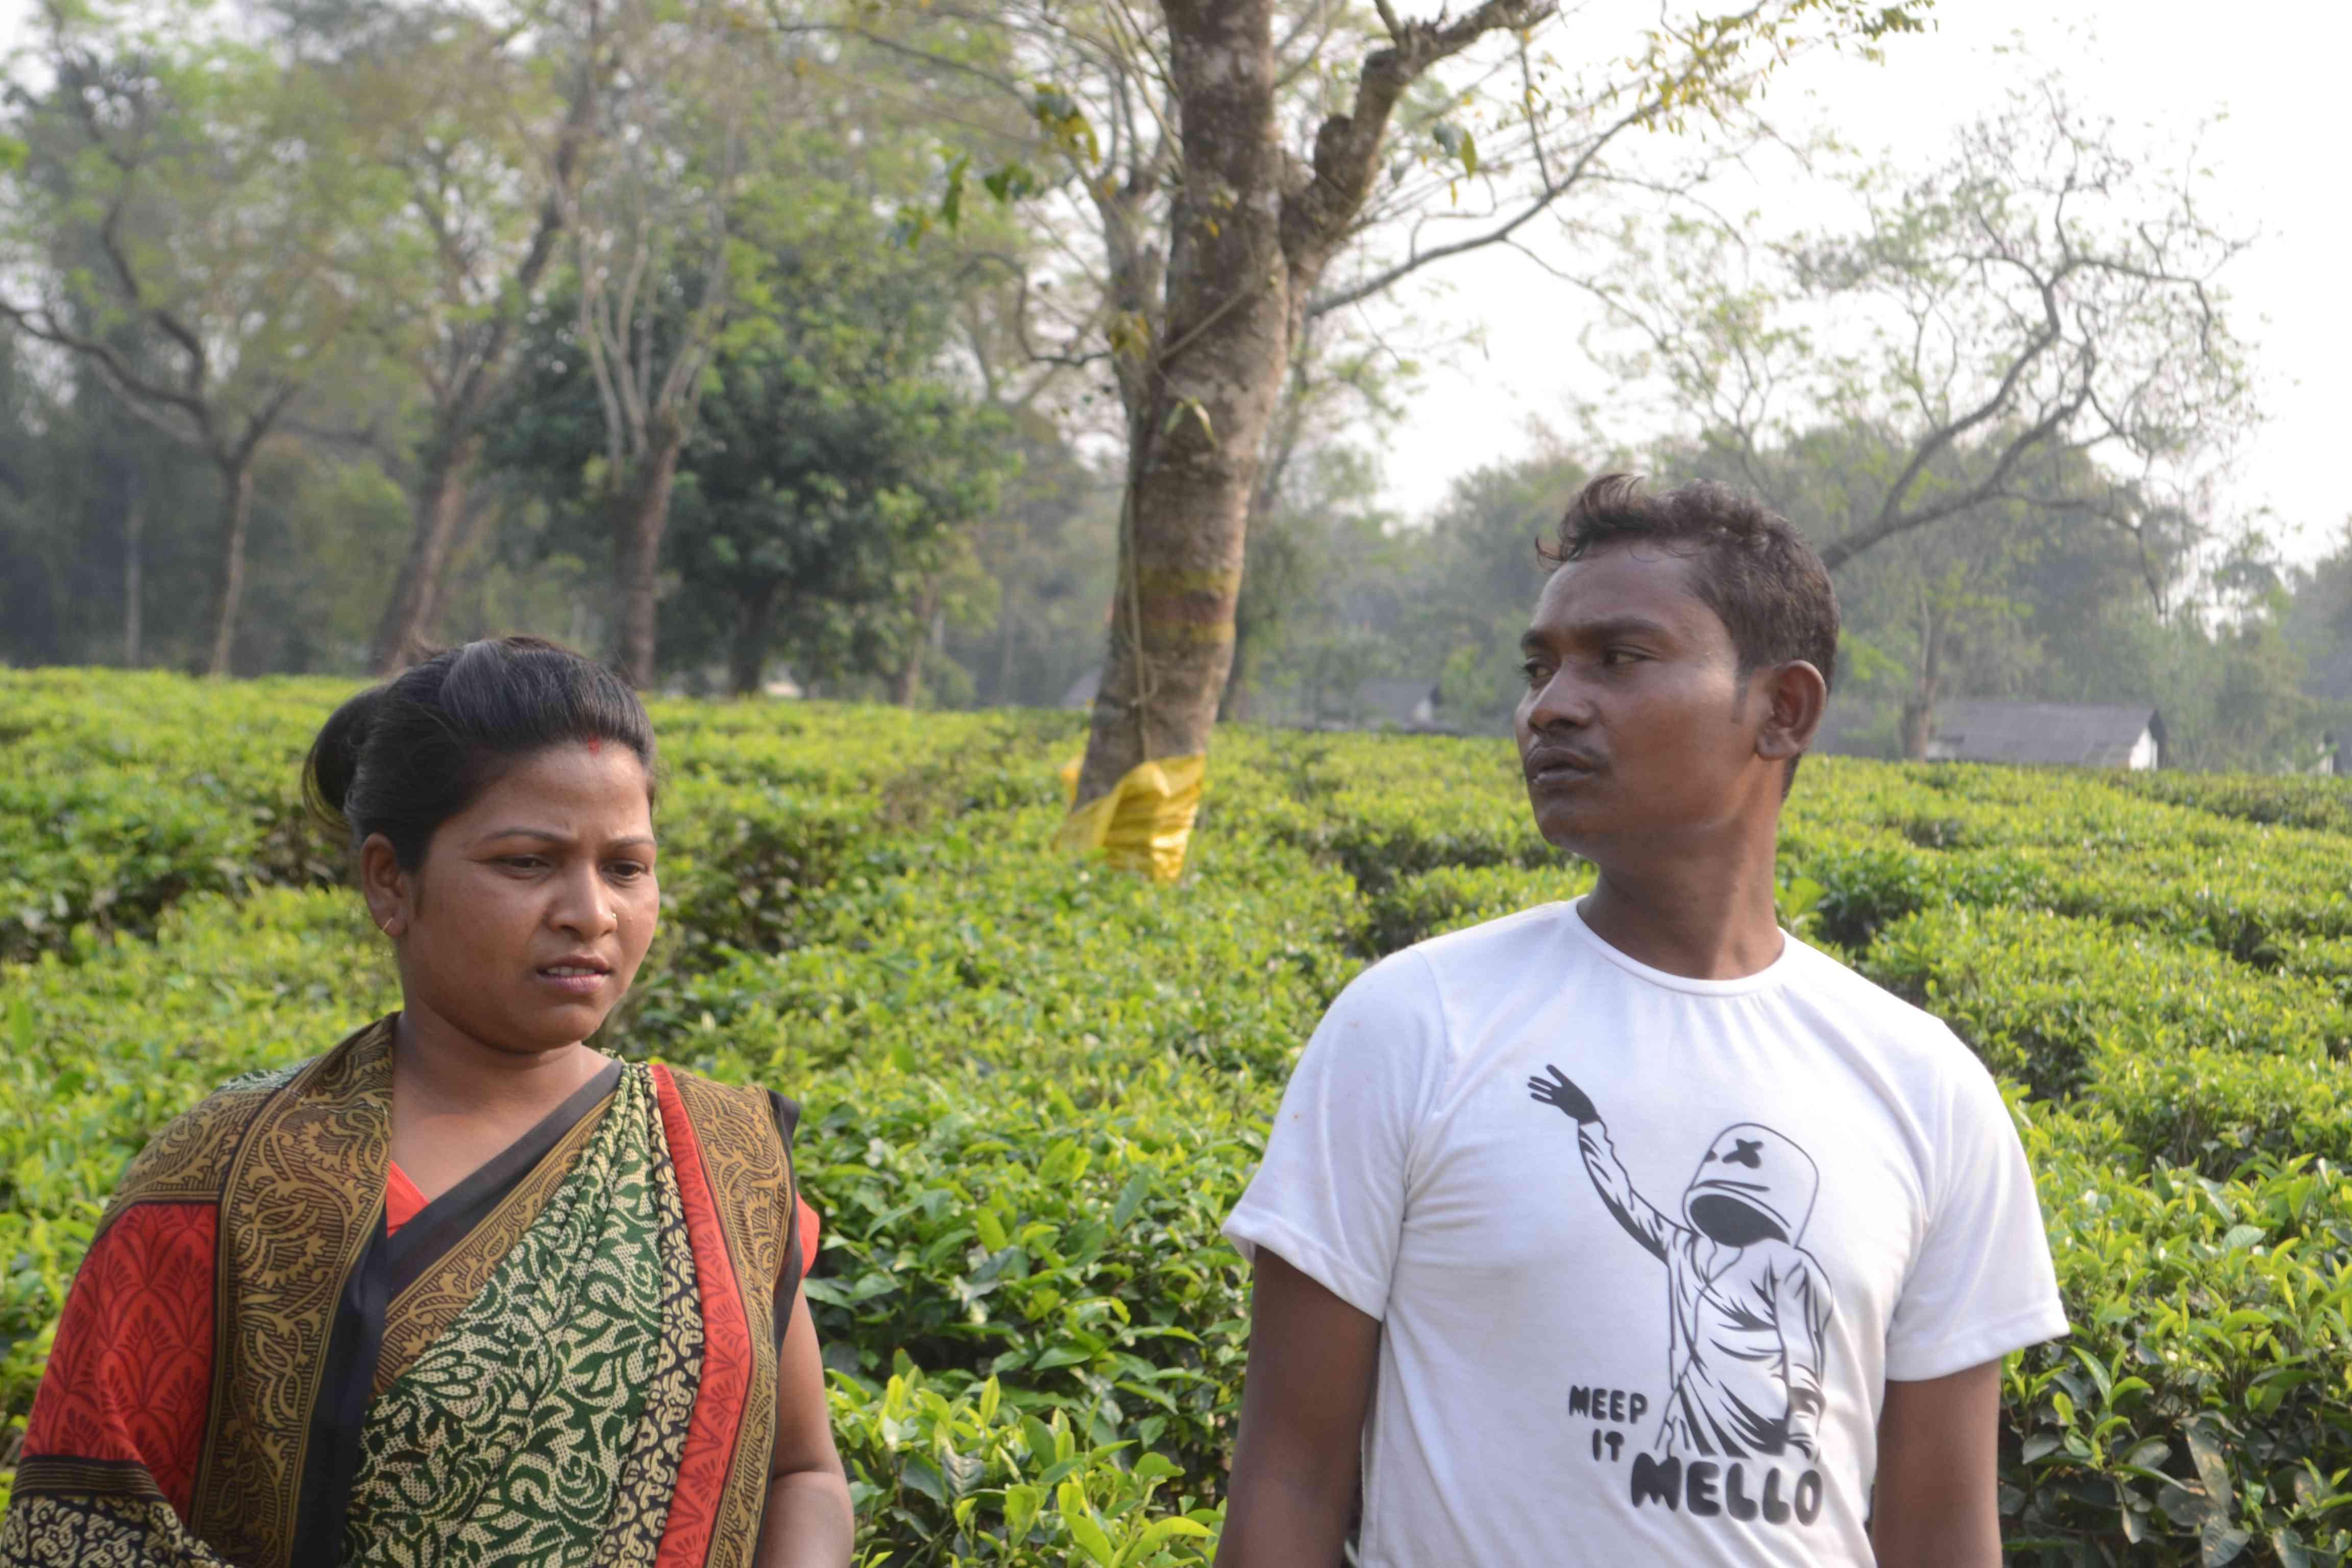 Deepanita Manki and Binod Munda in Tinsukhia. Photo credit: Anupam Chakravartty